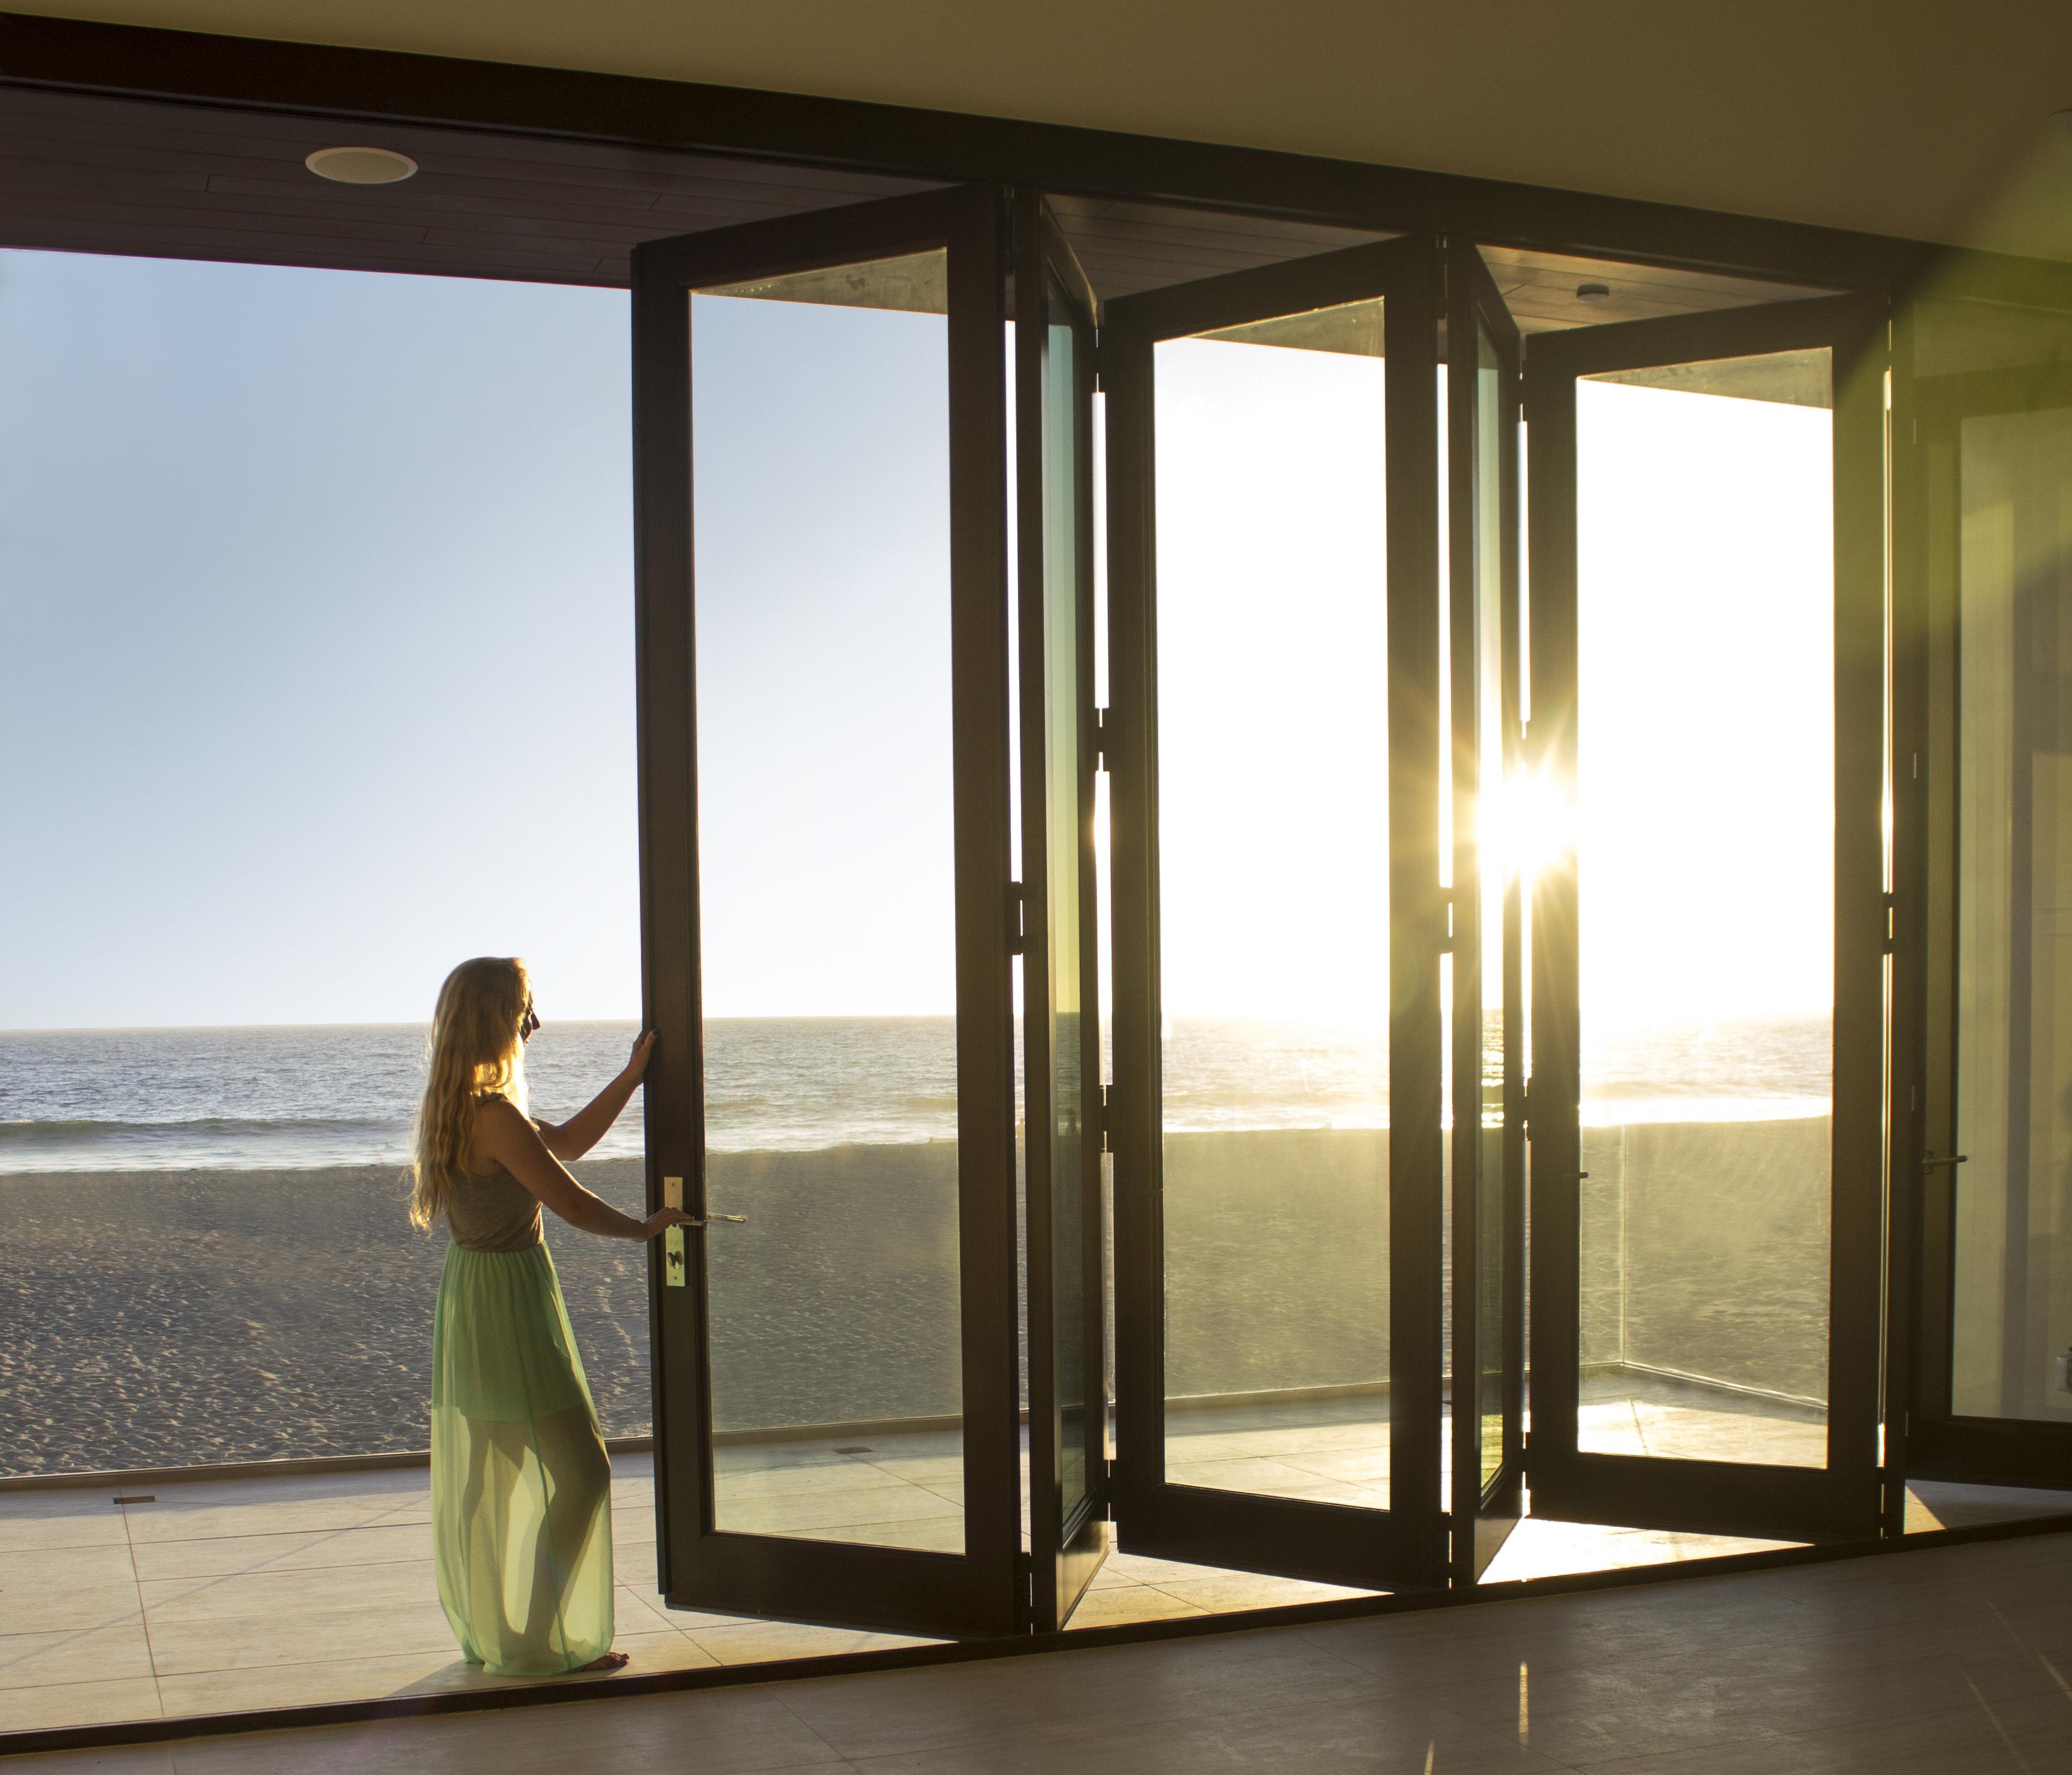 Bi Fold Sliding Patio Doorsdownload bi fold sliding patio doors house gallery